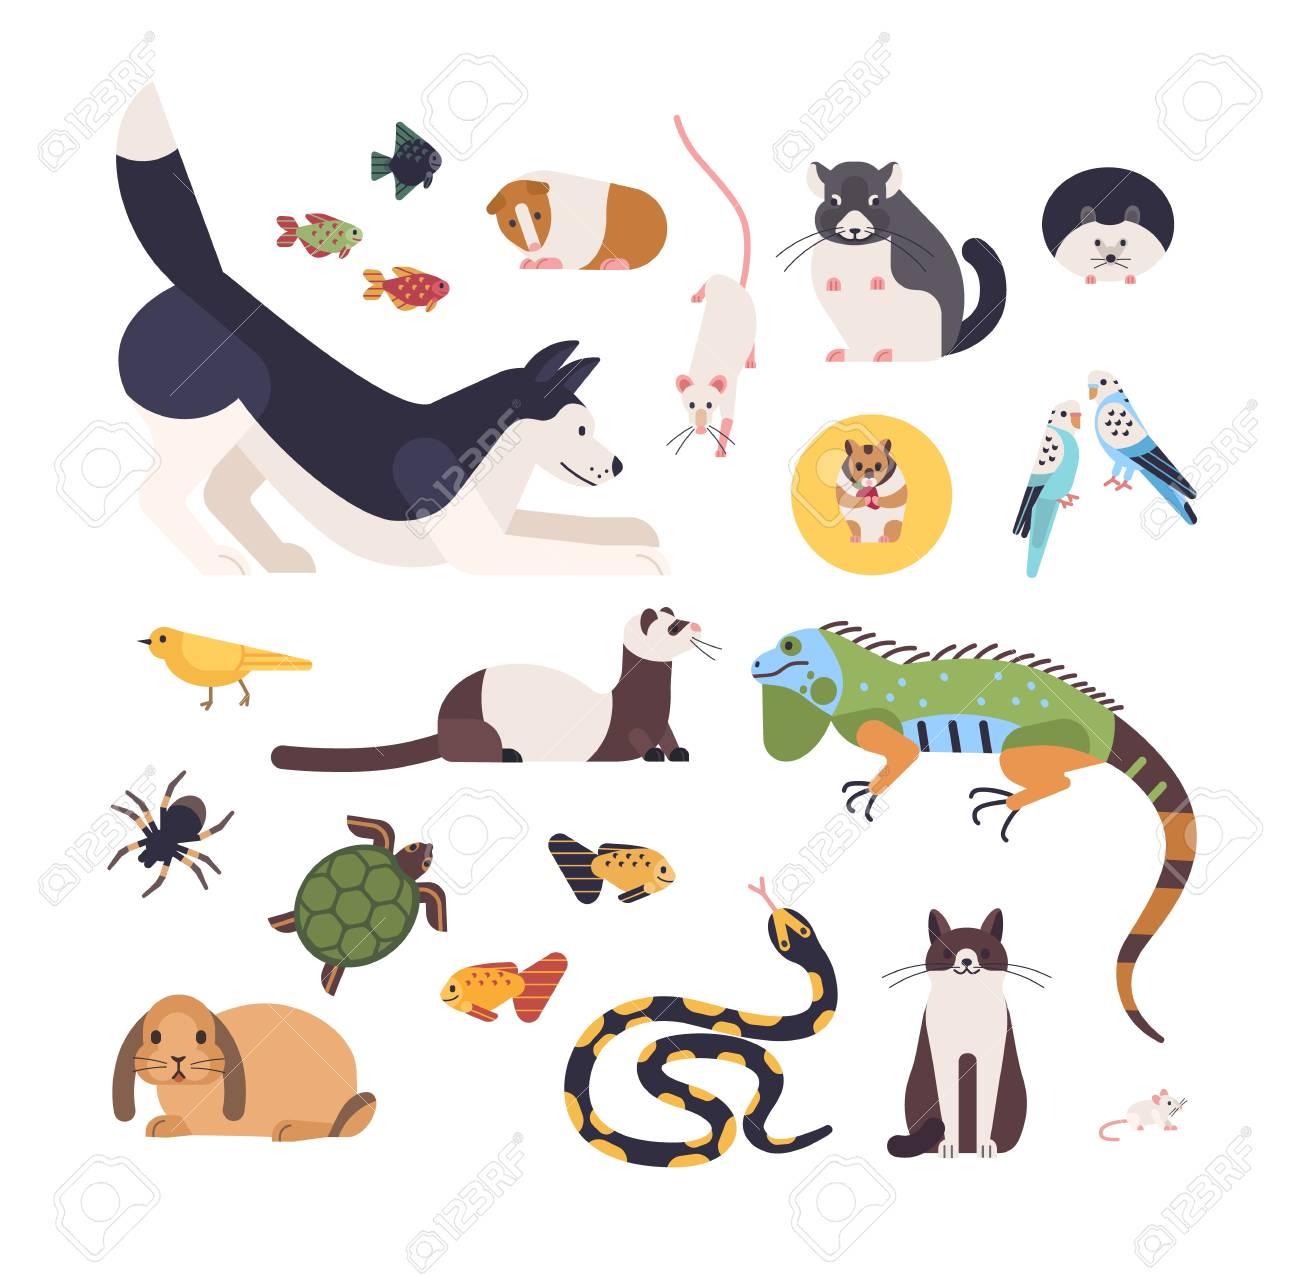 Colecao De Animais De Estimacao Isolado No Fundo Branco Conjunto